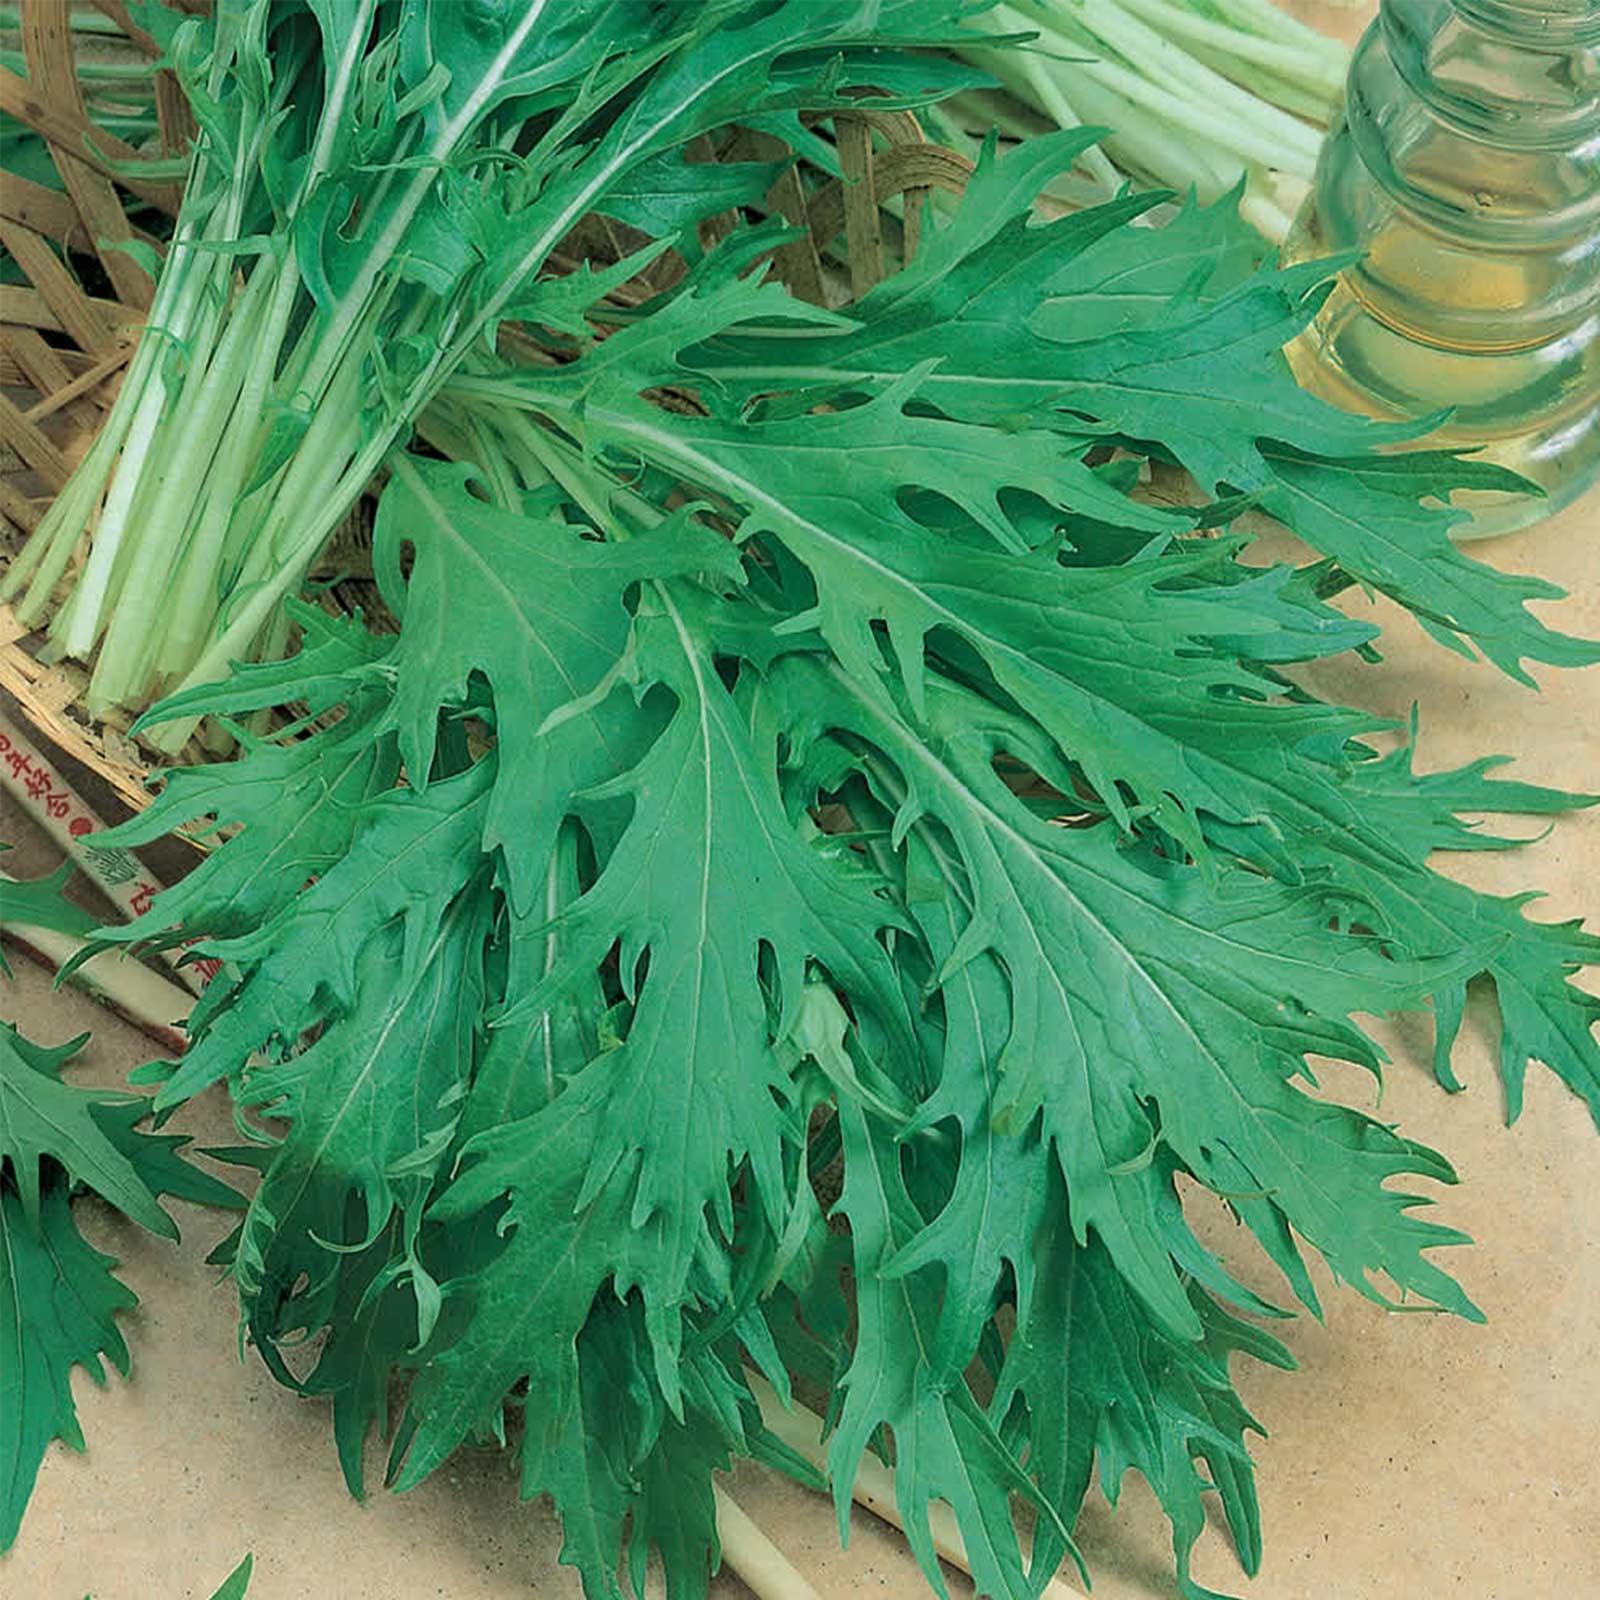 Japanese MustardOriental Vegetable Organic Green Mizuna Microgreen Seeds